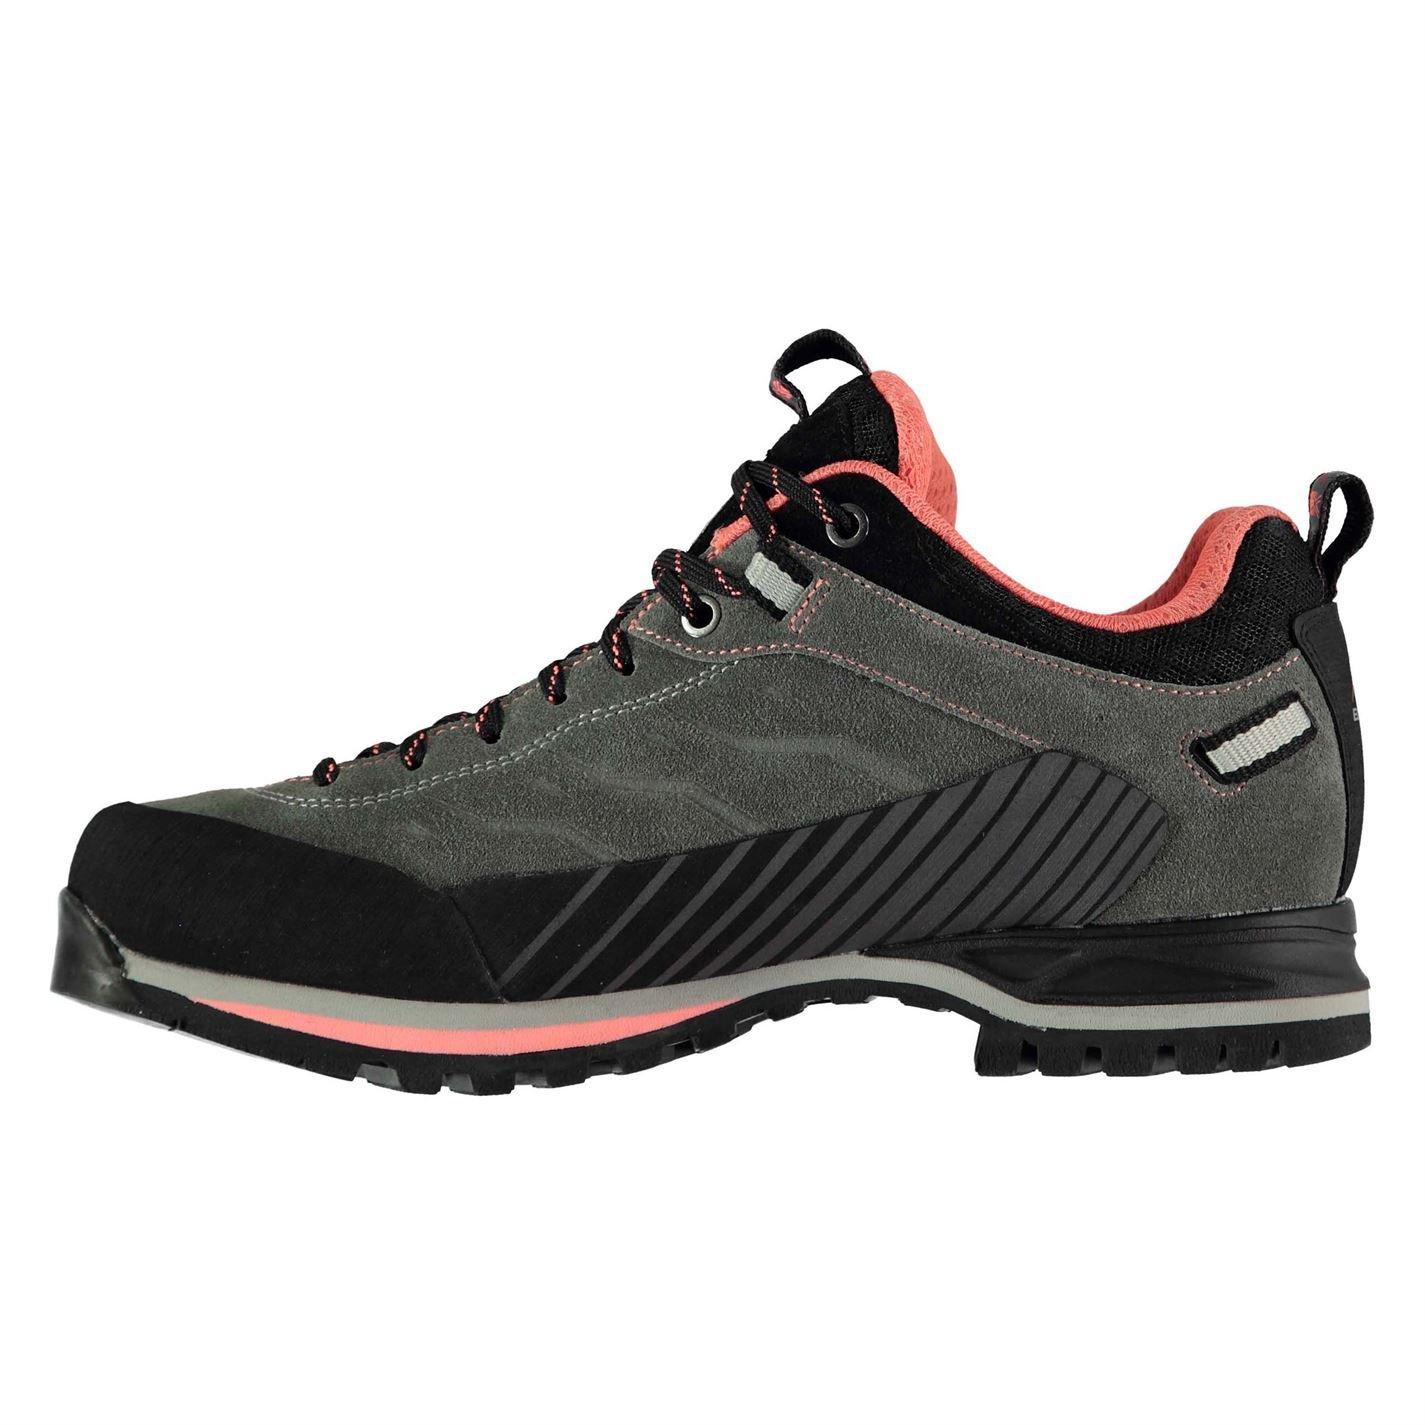 Trekking \u0026 Hiking Shoes Sports